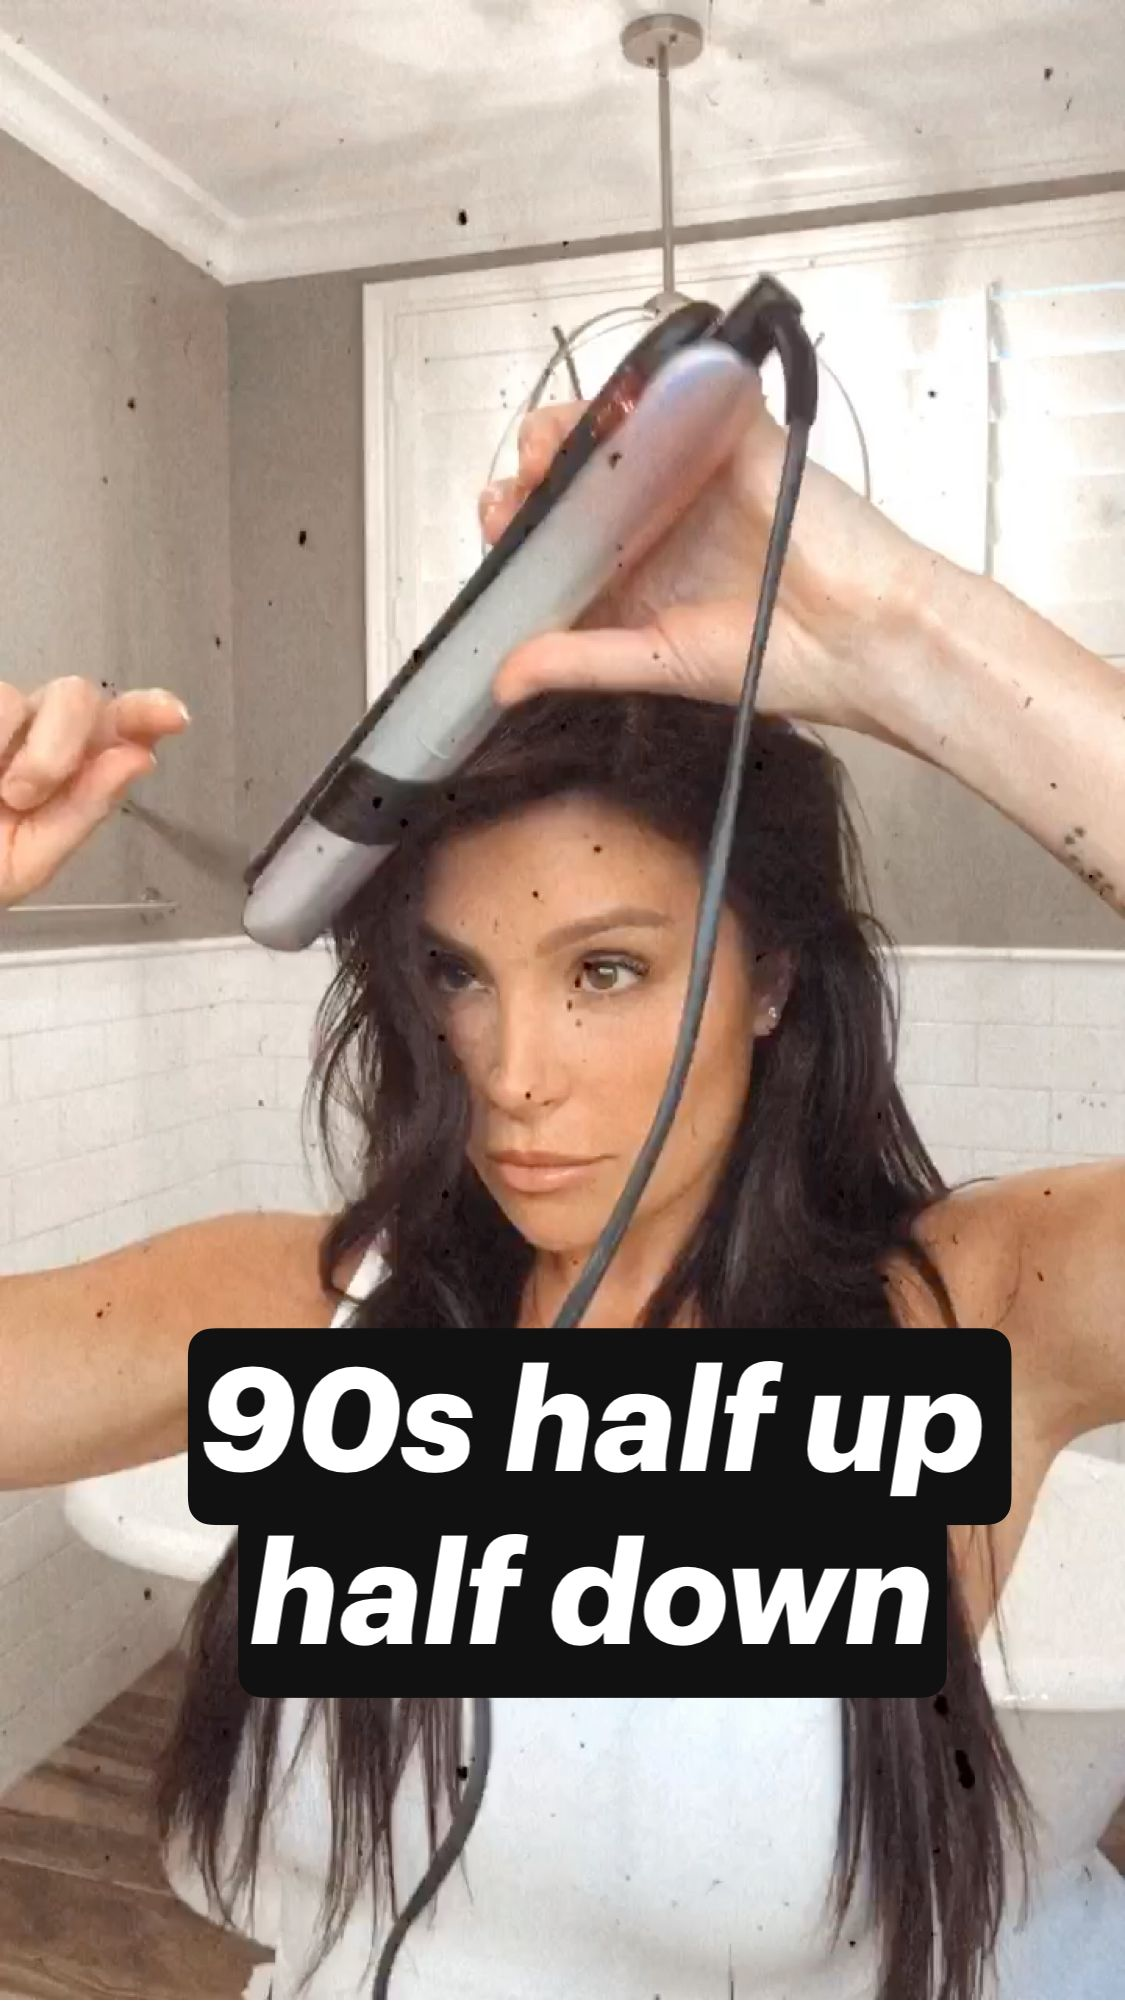 90s half up half down